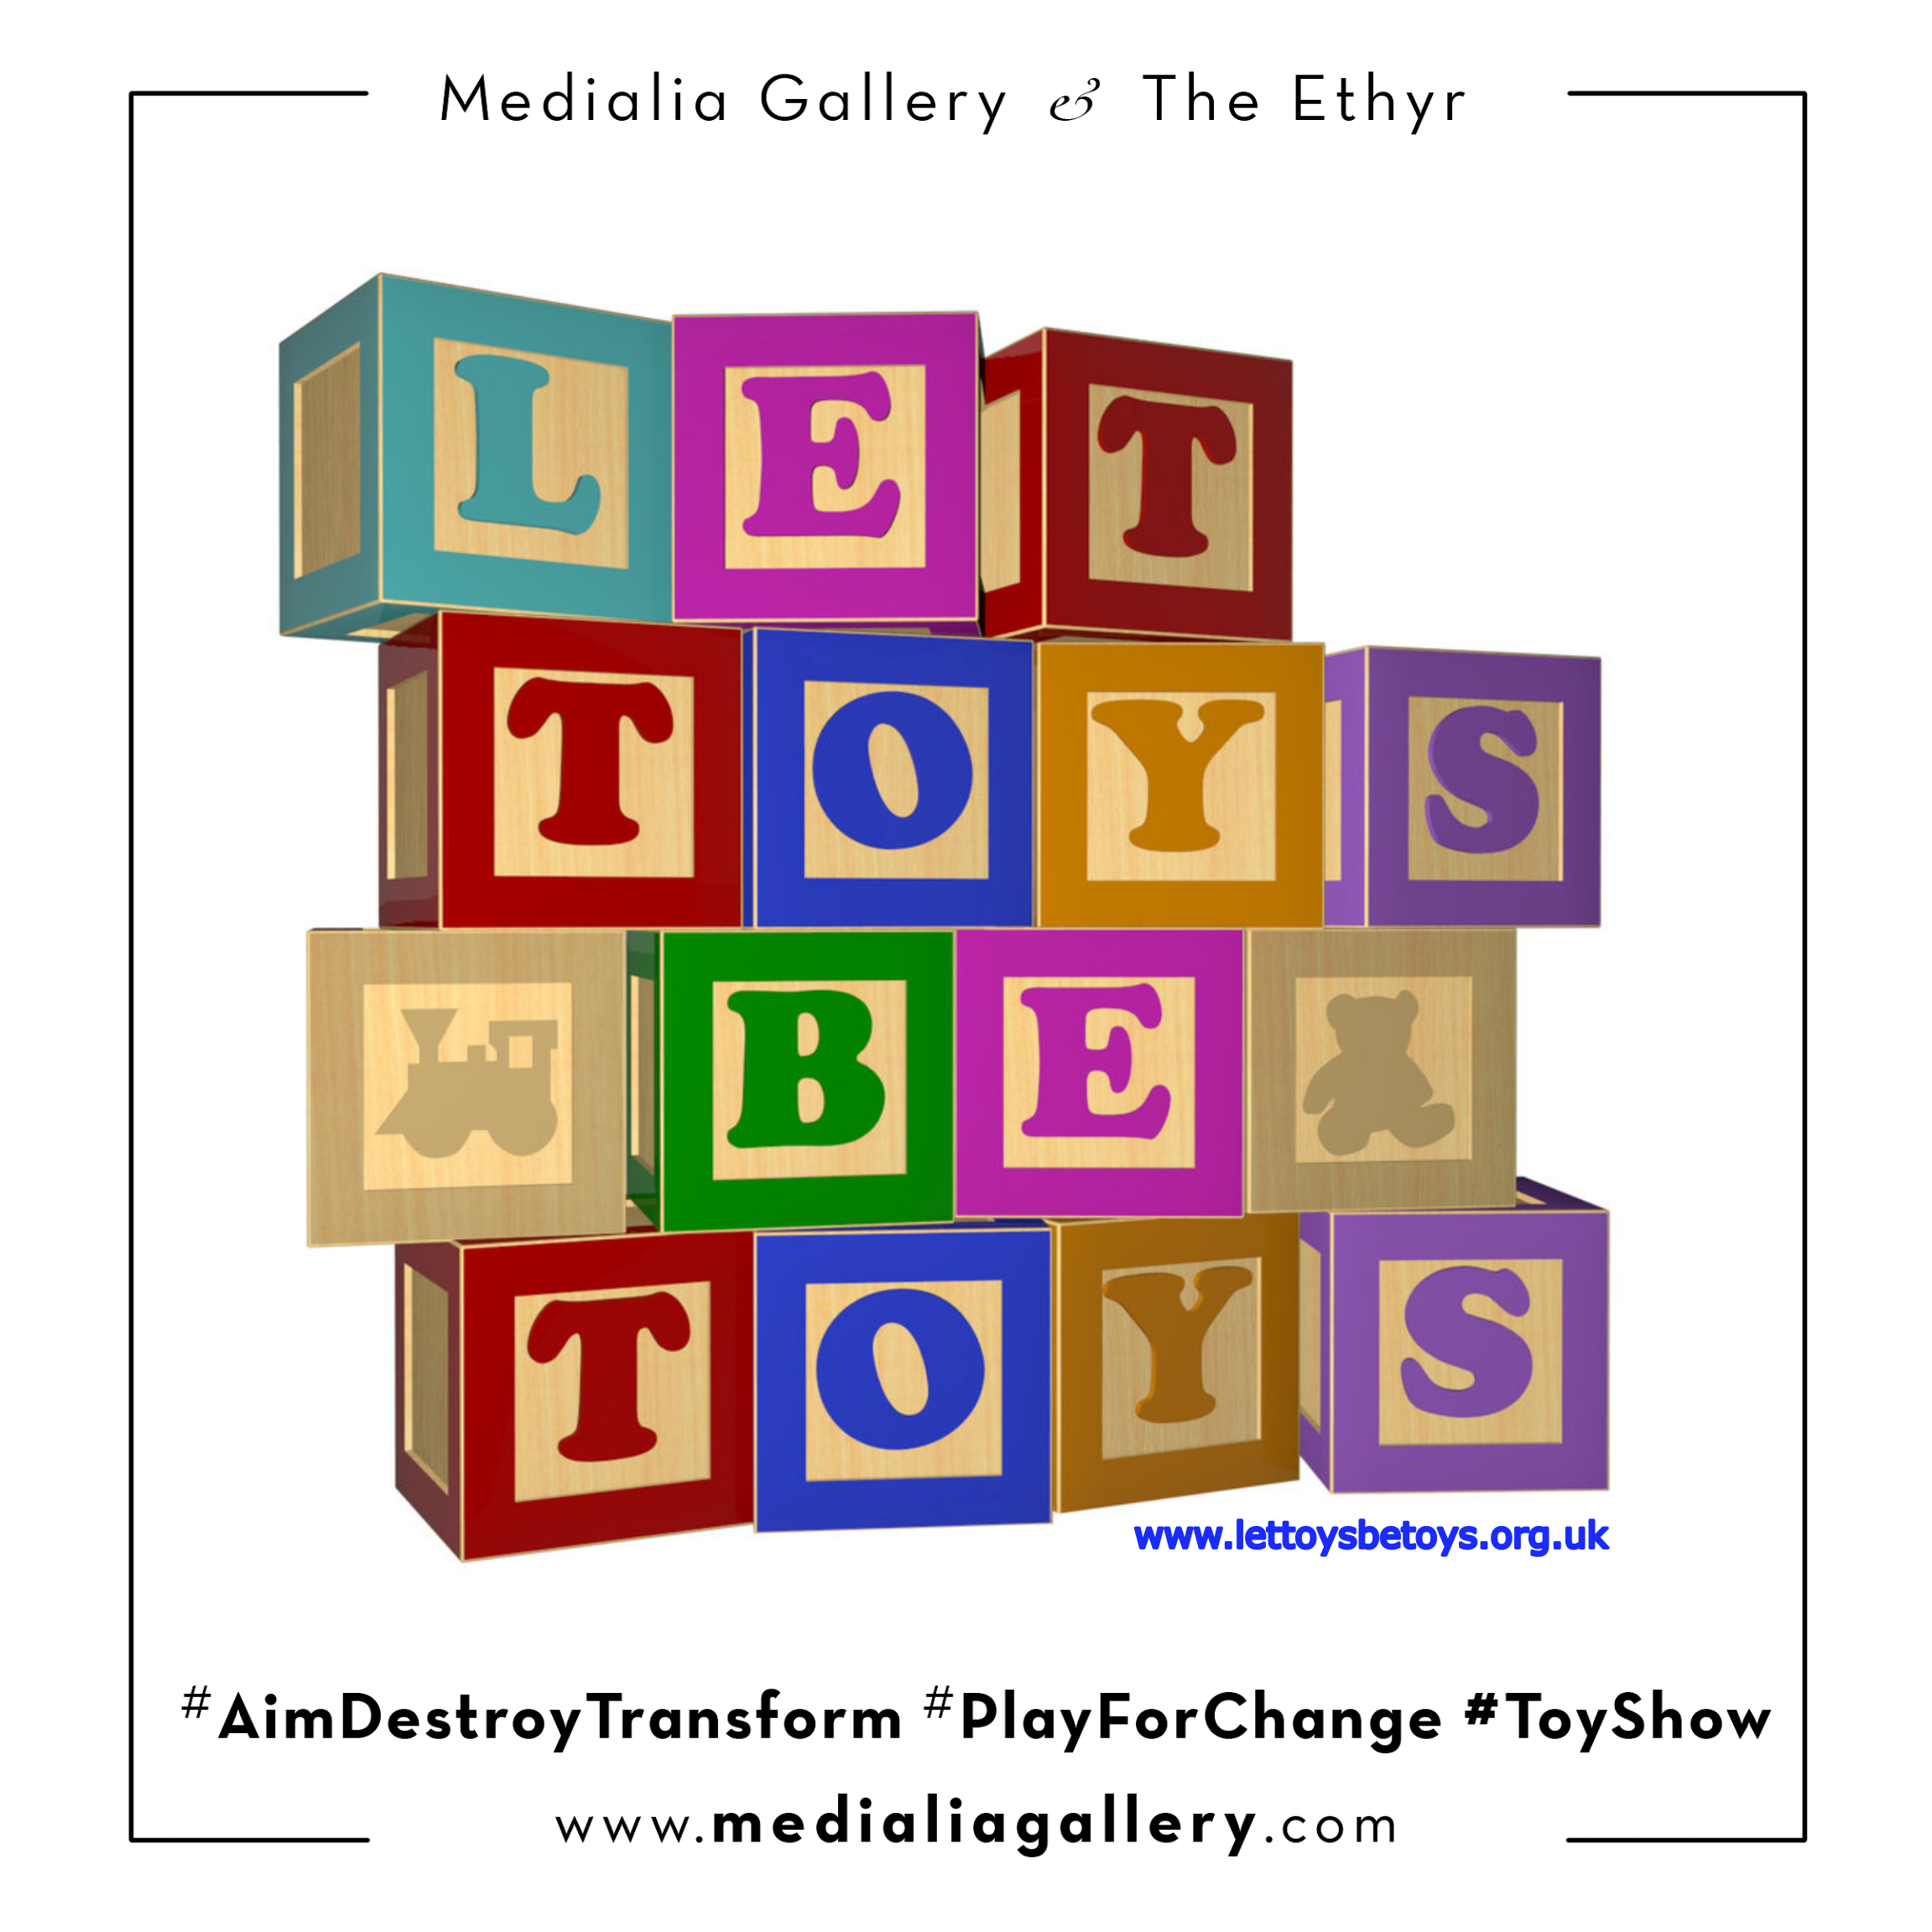 MedialiaGallery_The_Ethyr_AimDestroyTransform_Toy_Show_Let_Toys_Be_Toys_November_2017.jpg.png